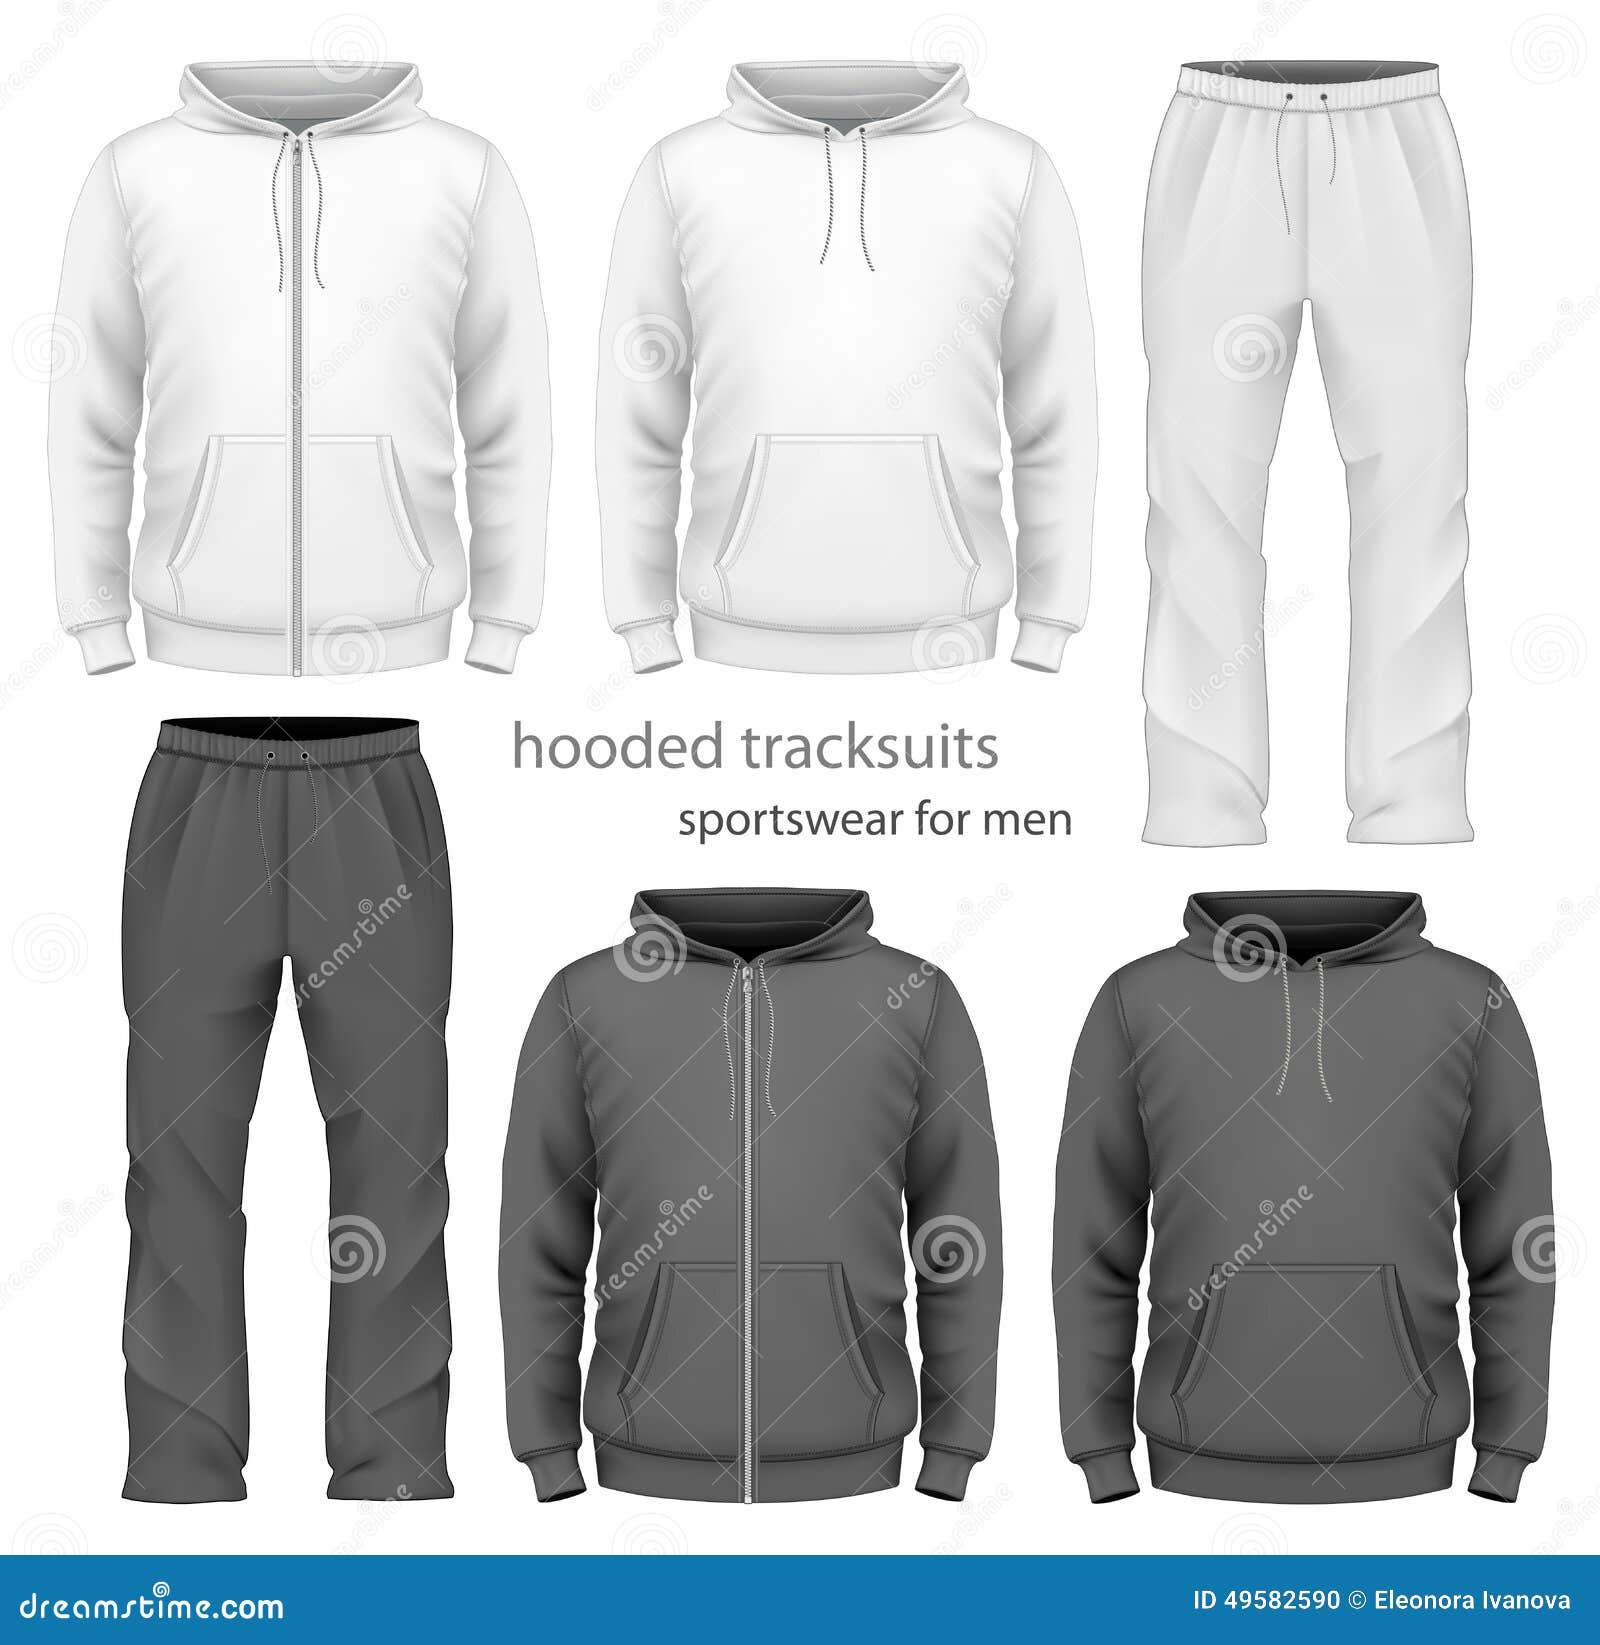 a14fd5972c4d Men hooded tracksuit. stock vector. Illustration of design - 49582590